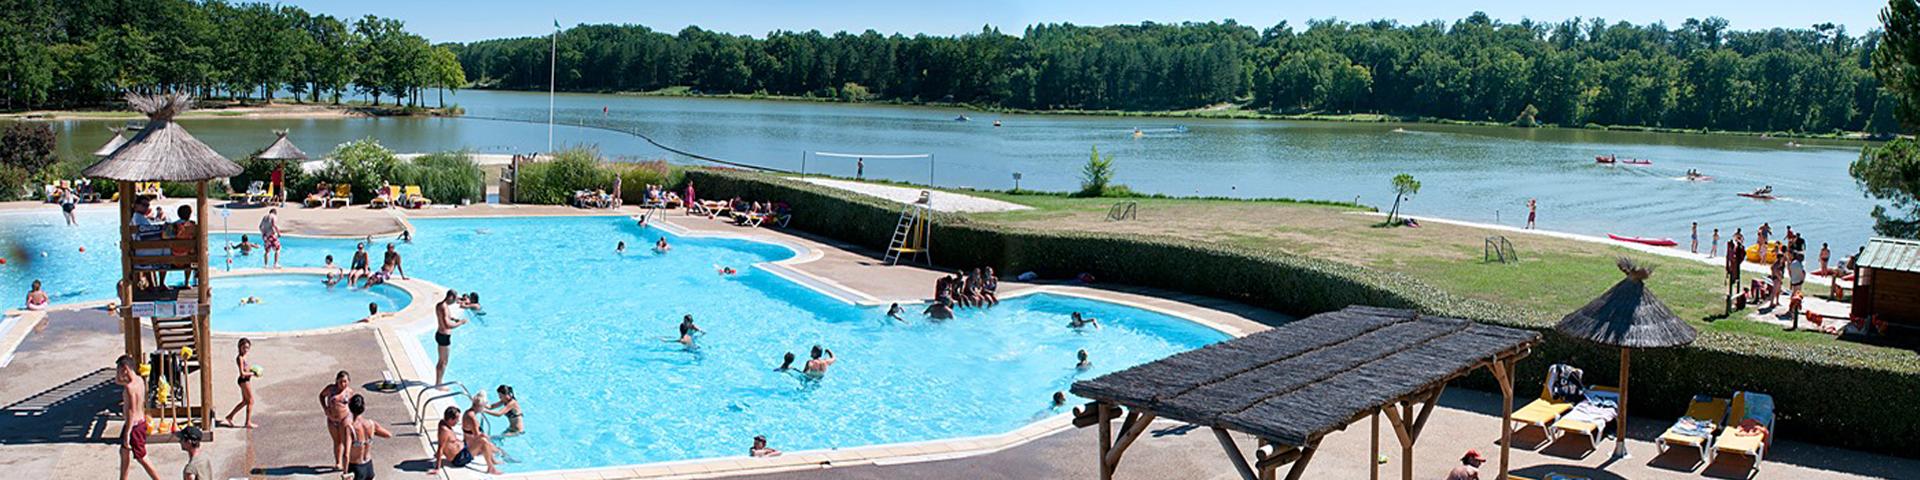 piscine-221